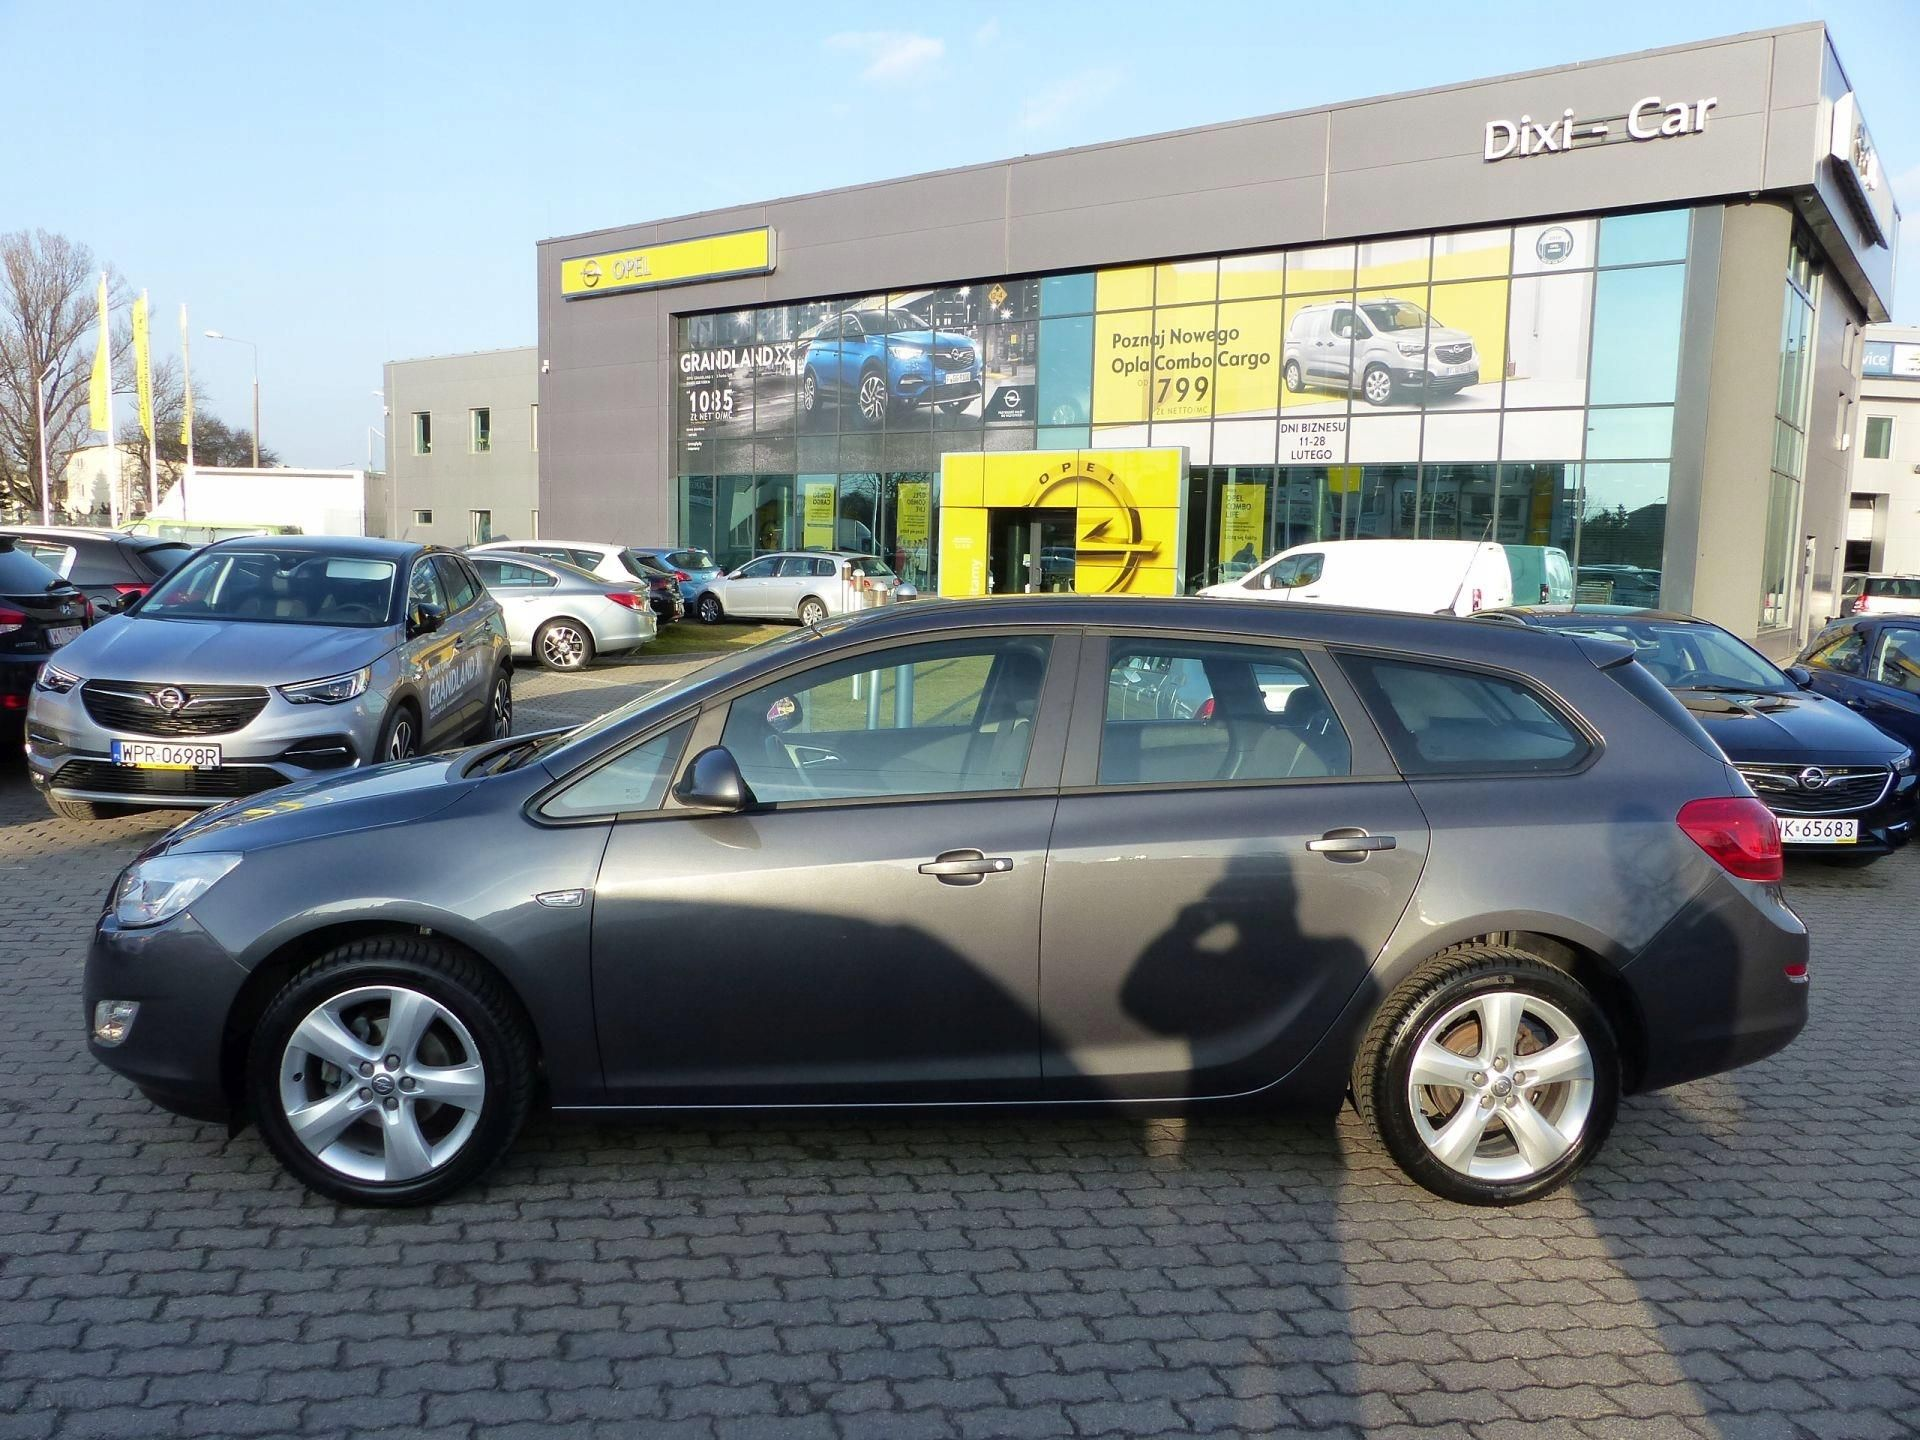 W superbly Opel Astra IV 1,4 120KM MT6 Kombi Enjoy, Felgi - Opinie i ceny na YH77